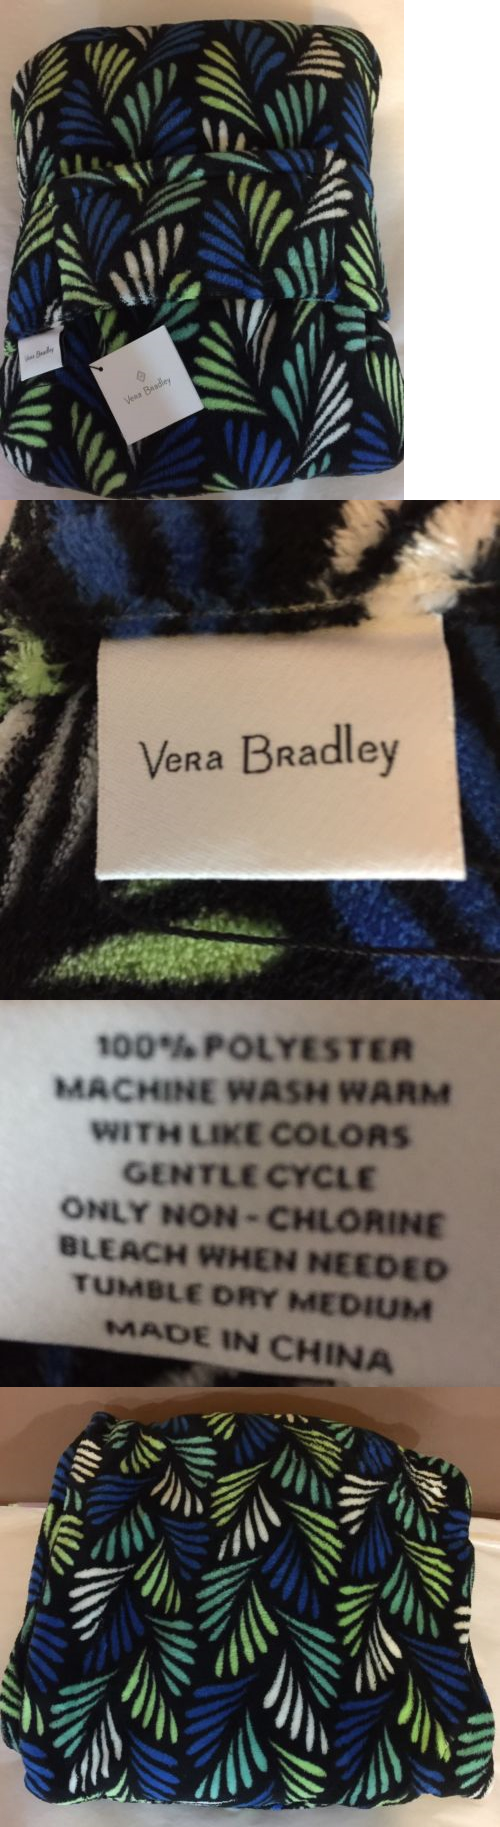 Other womens accessories vera bradley bandana fans throw